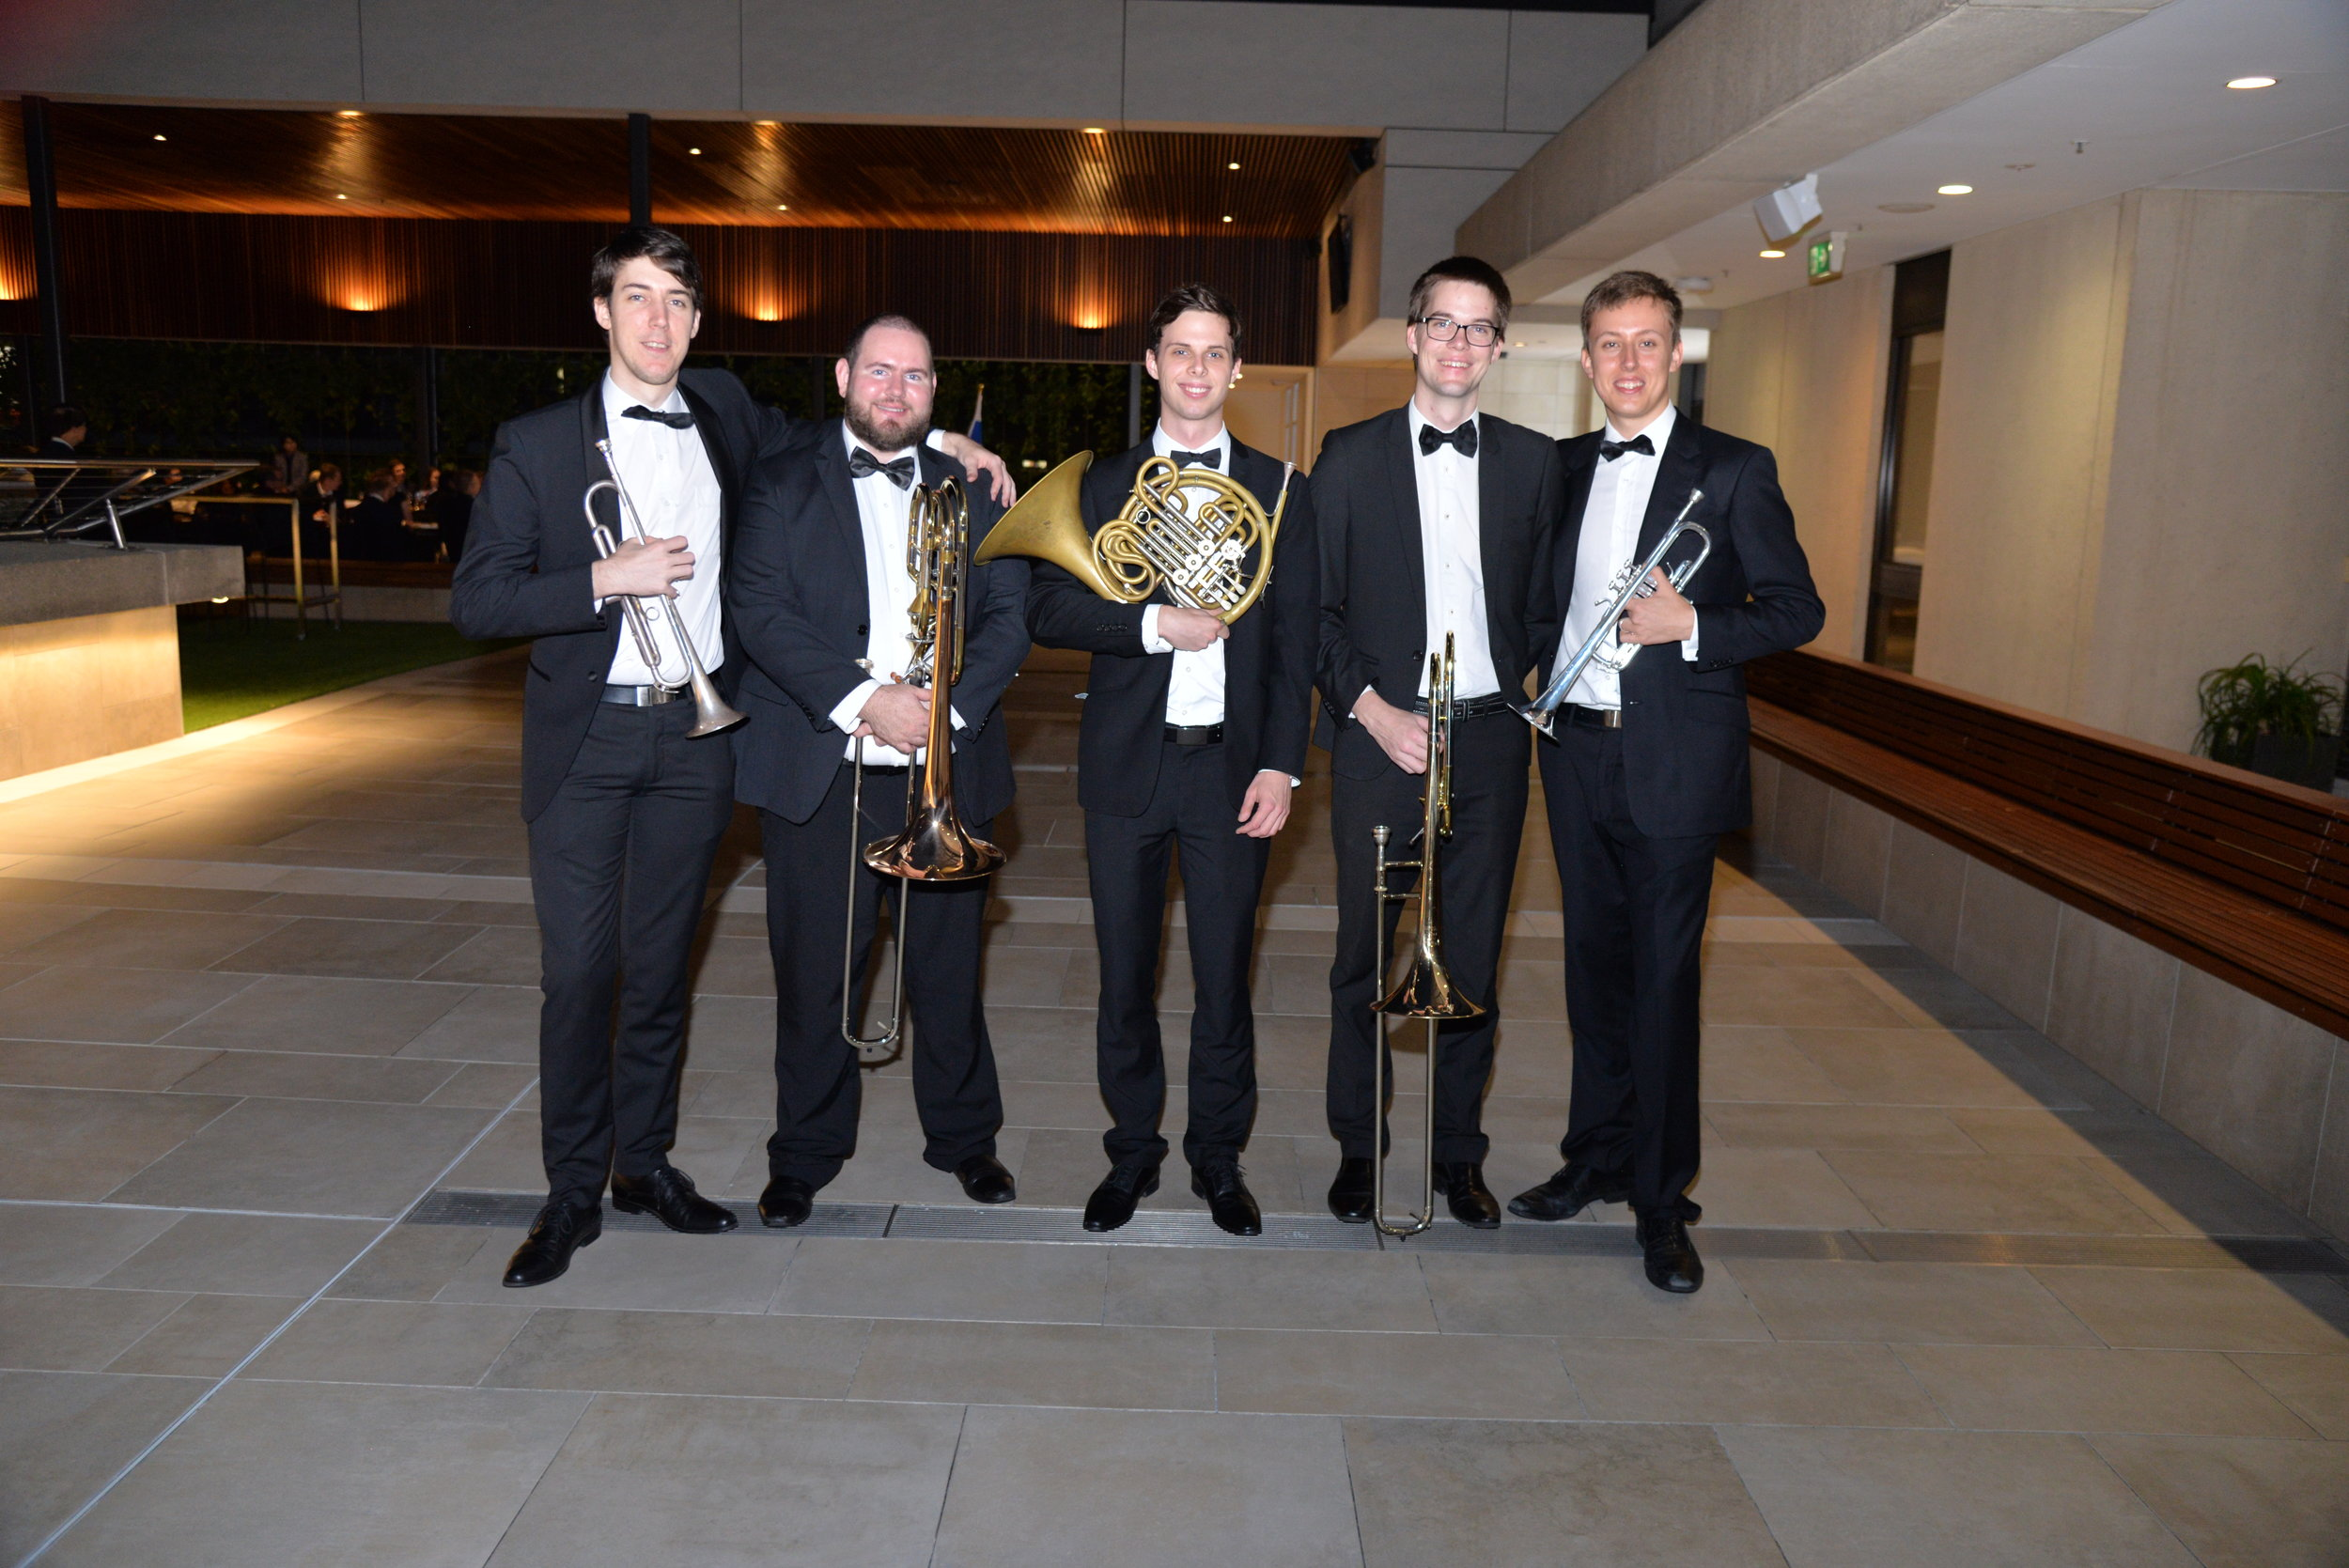 Left to Right: Patrick McKechie, Steven Port, Tim Allen-Ankins, Paul Black, Patrick Nowland